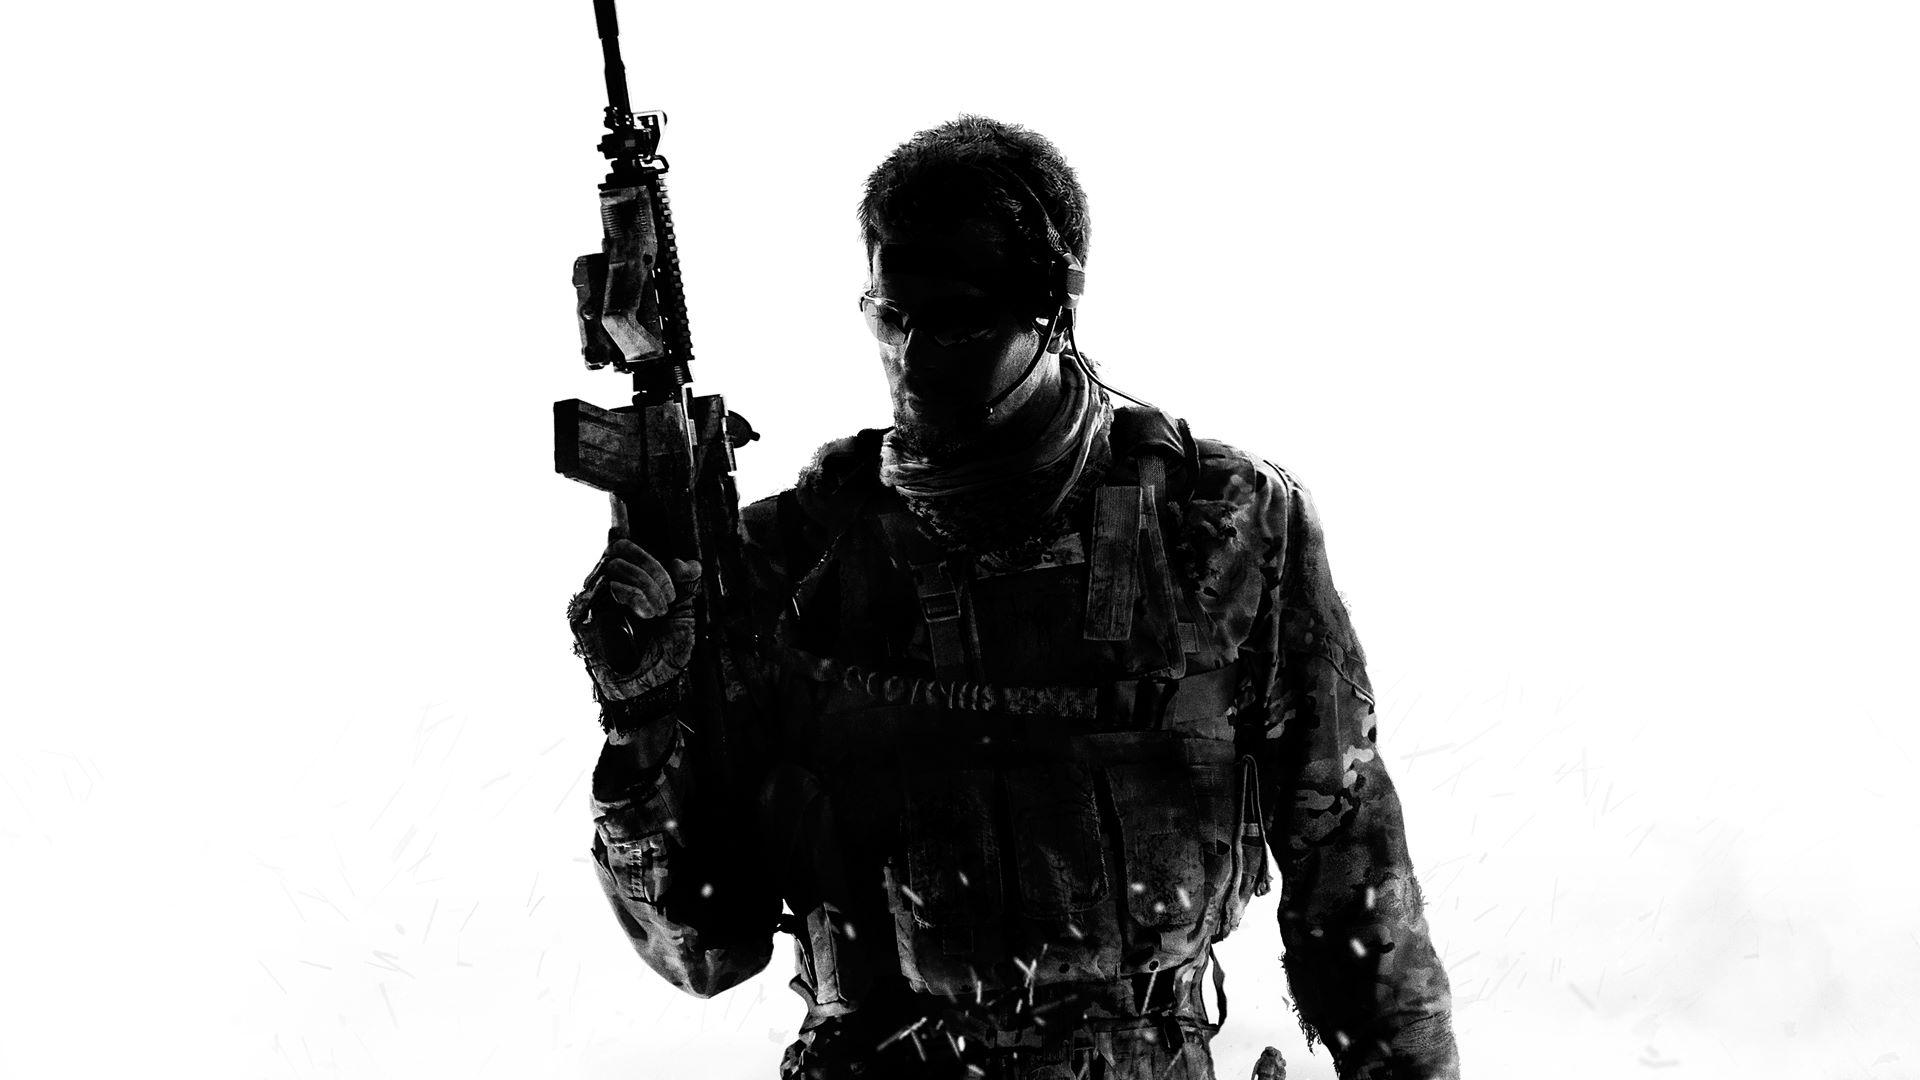 Modern Warfare 3 Wallpaper